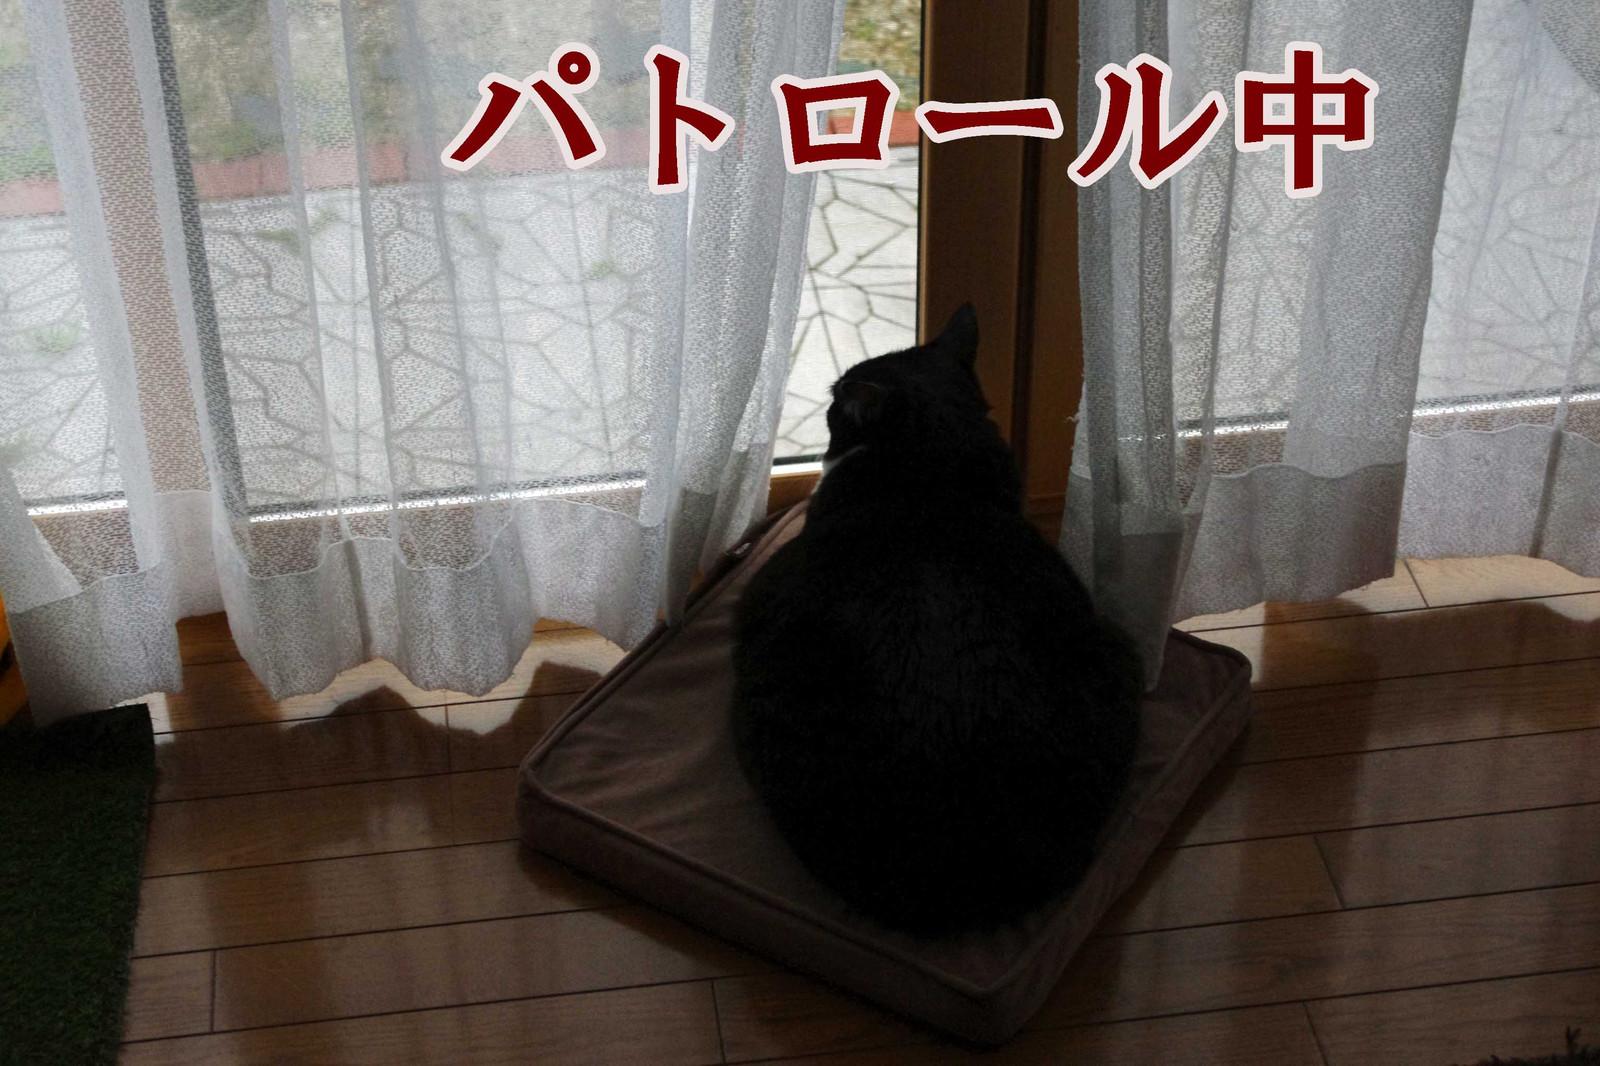 2012_04_26_4092_edited1